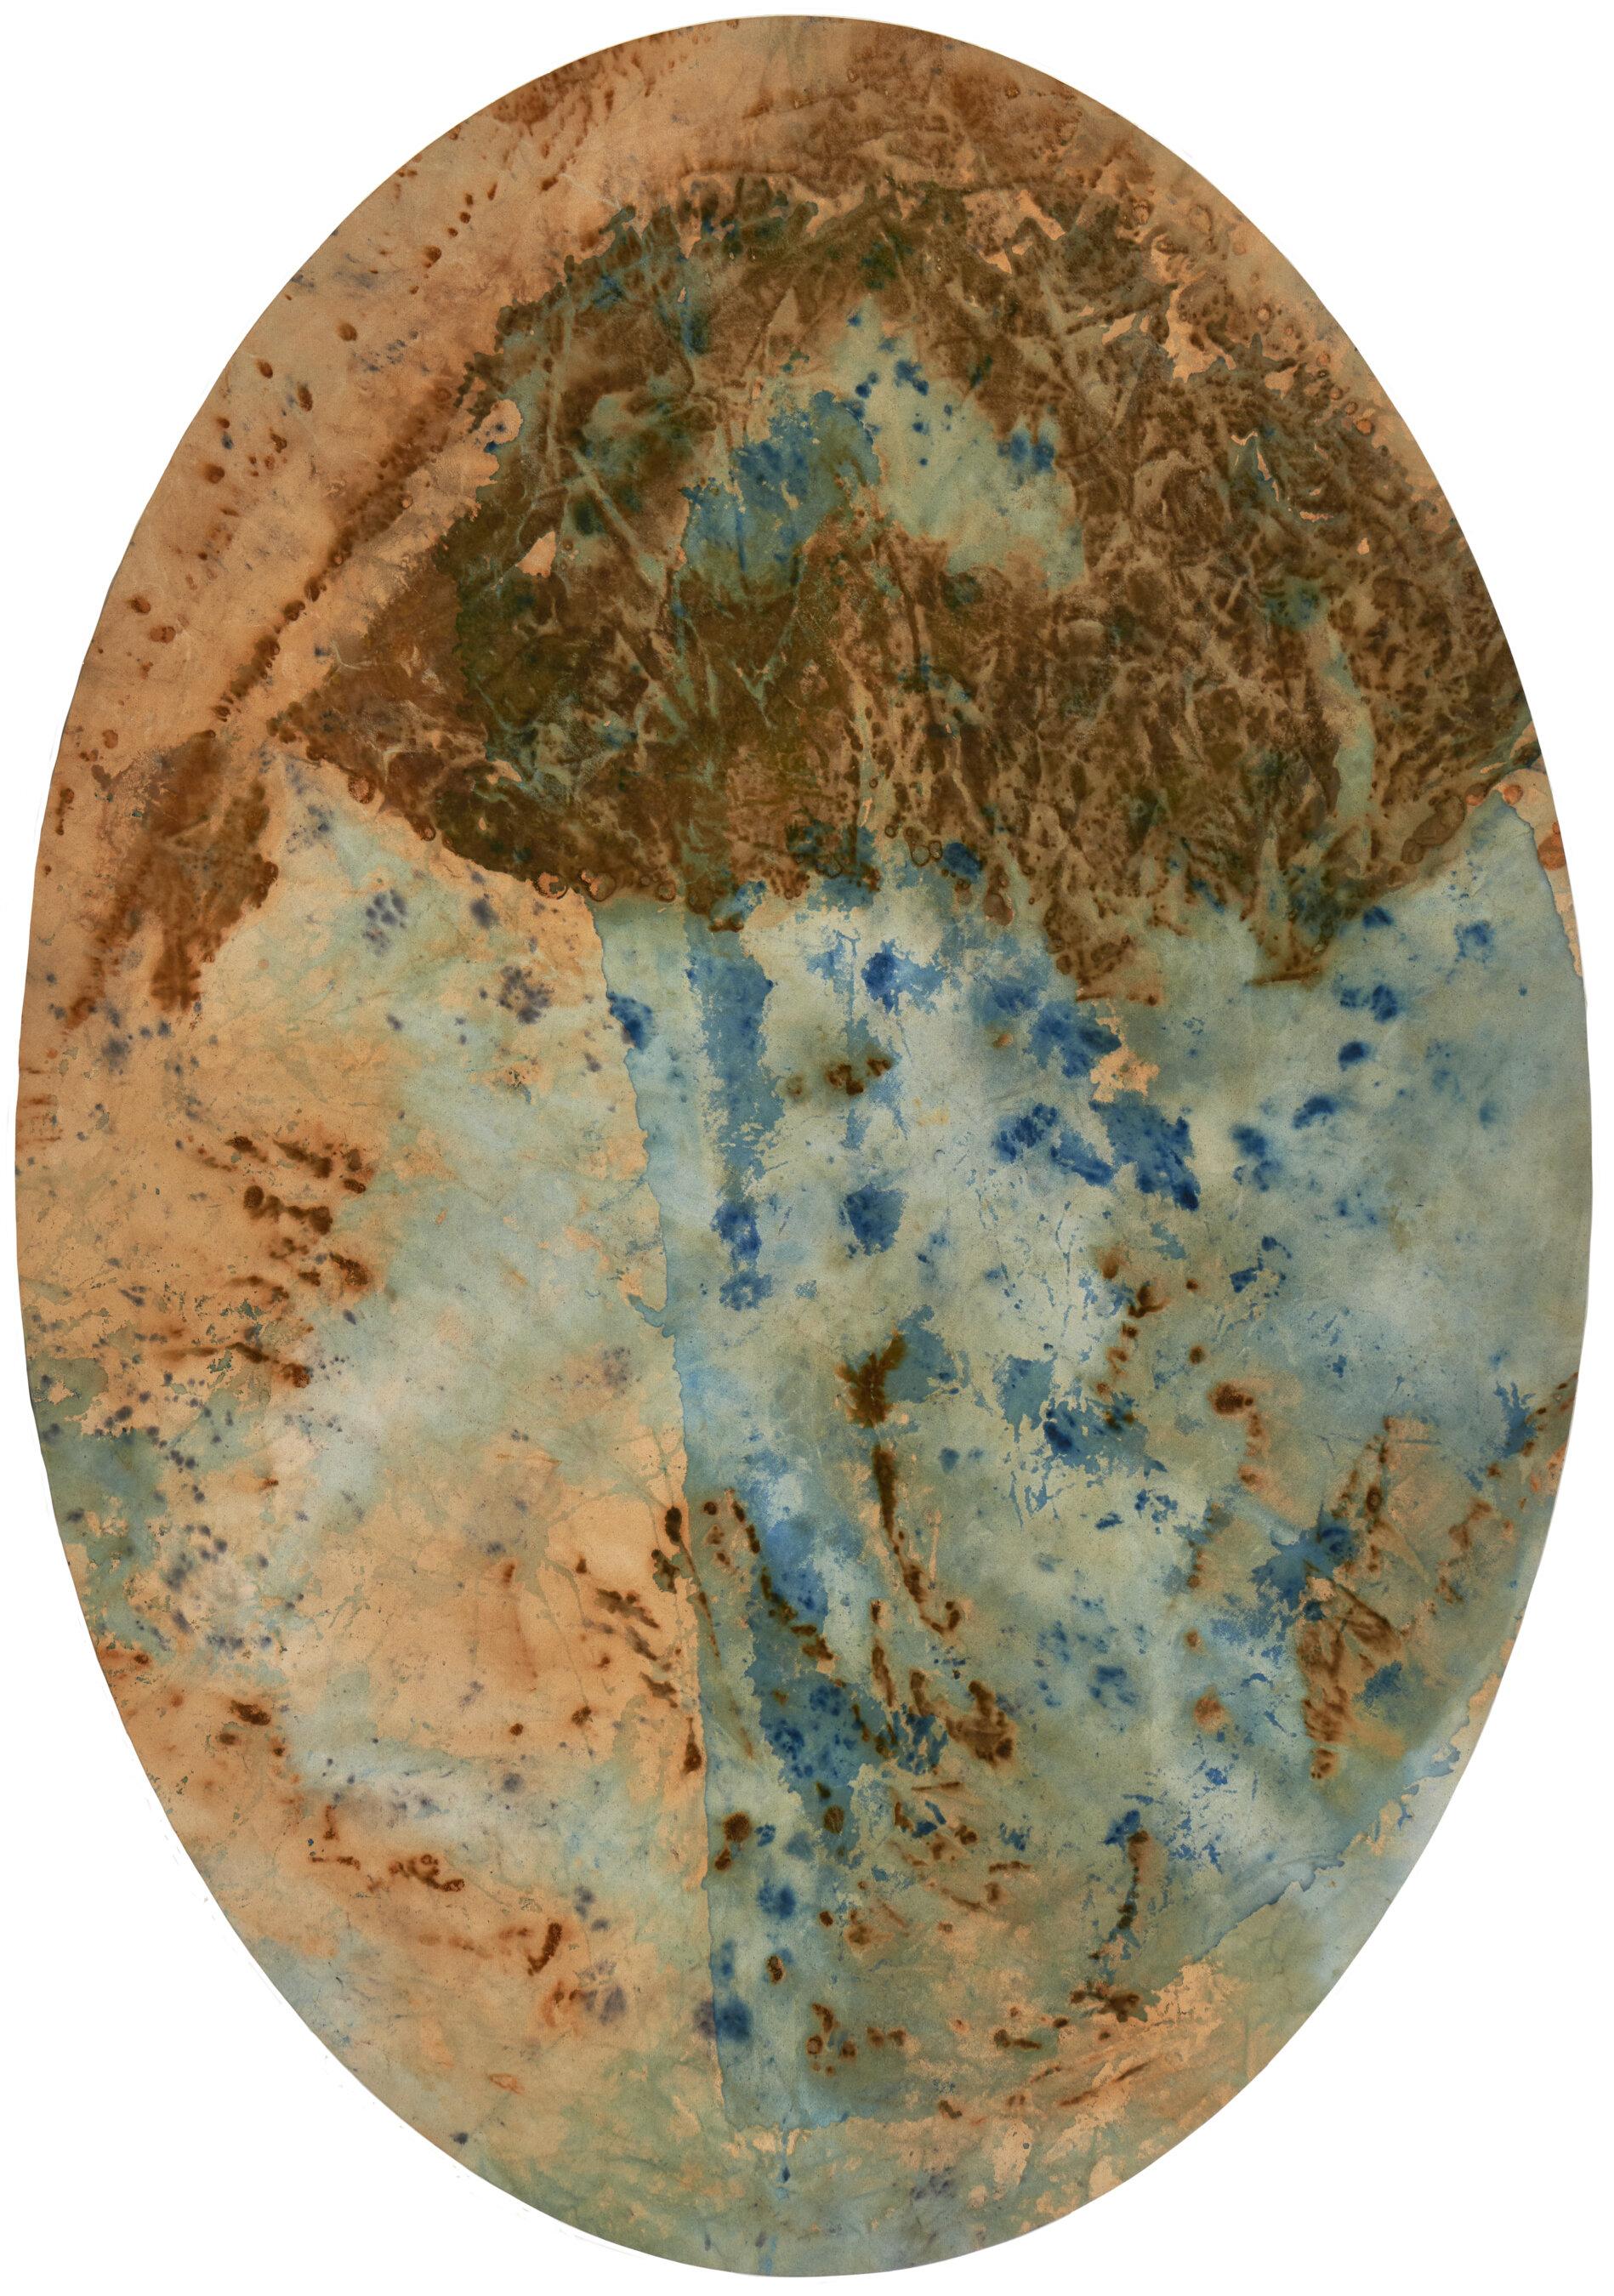 Vessel, Cyanotype and Rust on Canvas, 5 x 3 feet, 2019